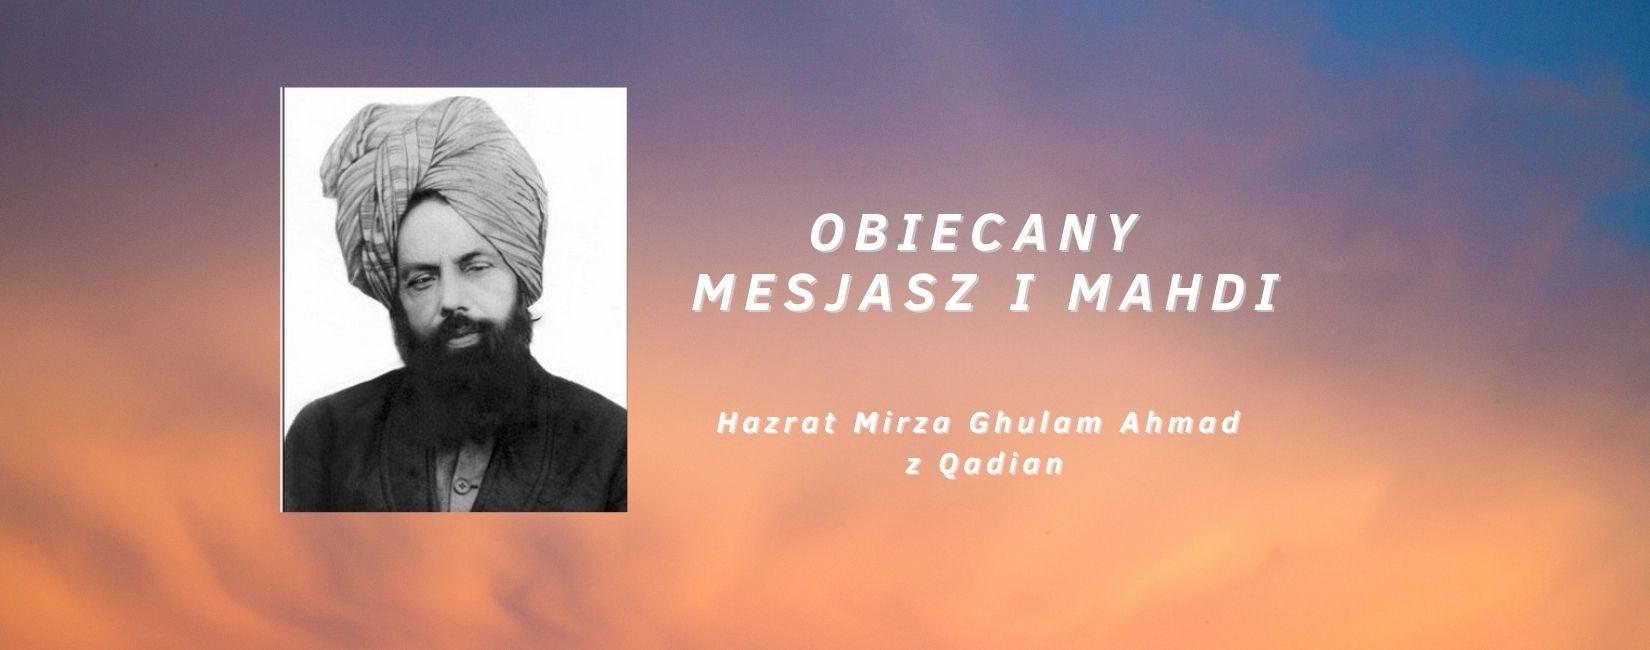 Obiecany Mesjasz i Mahdi - Hazrat Mirza Ghulam Ahmad